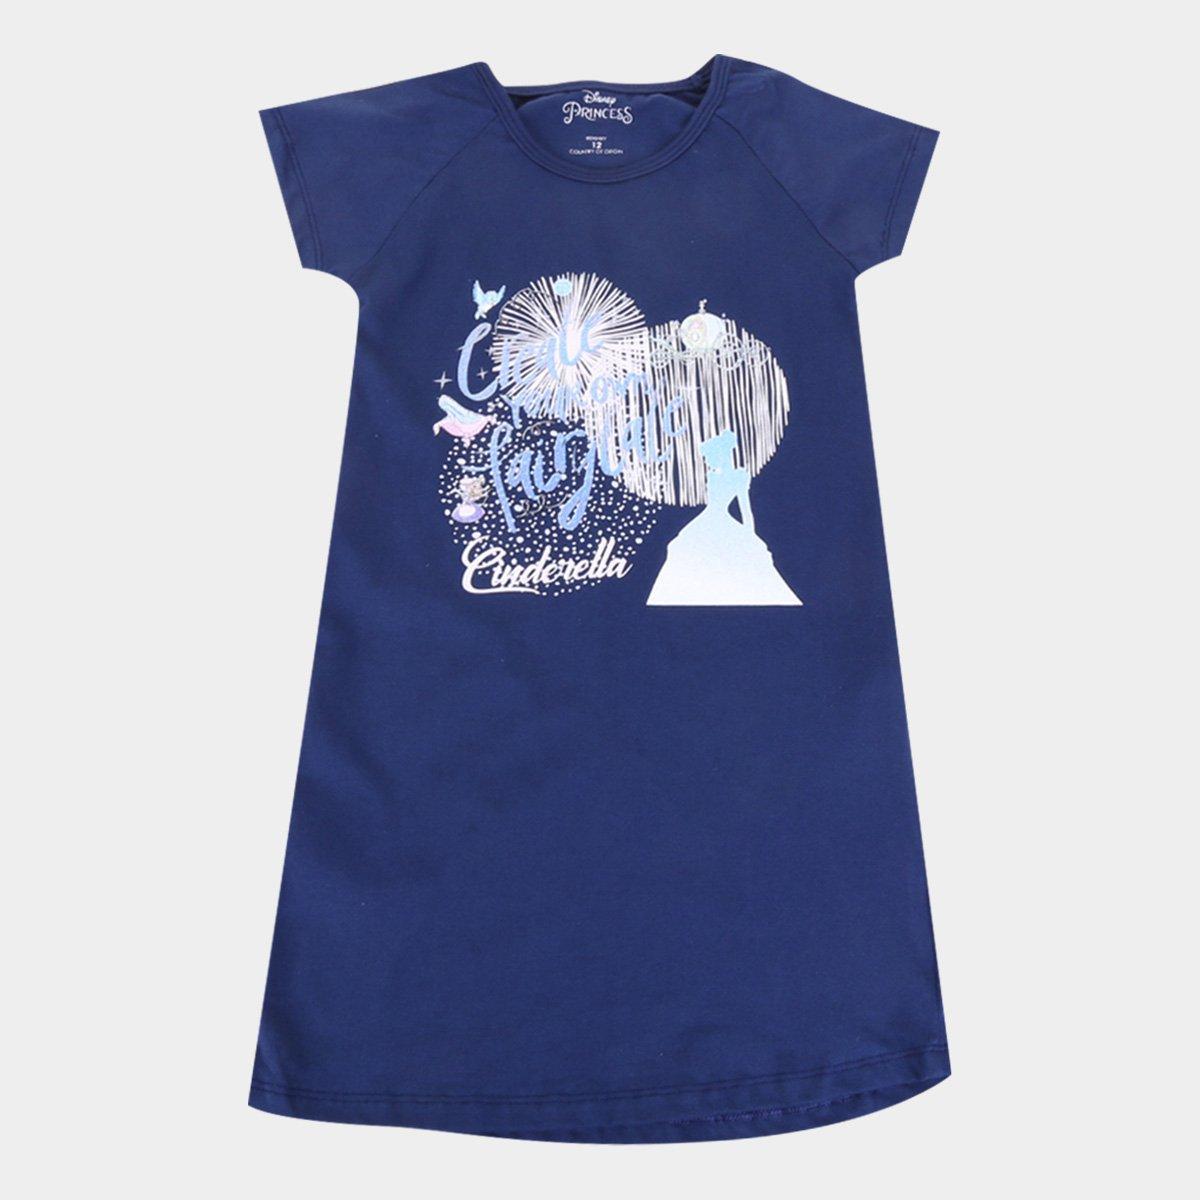 Vestido Infantil Disney Cinderela Fairy Tail